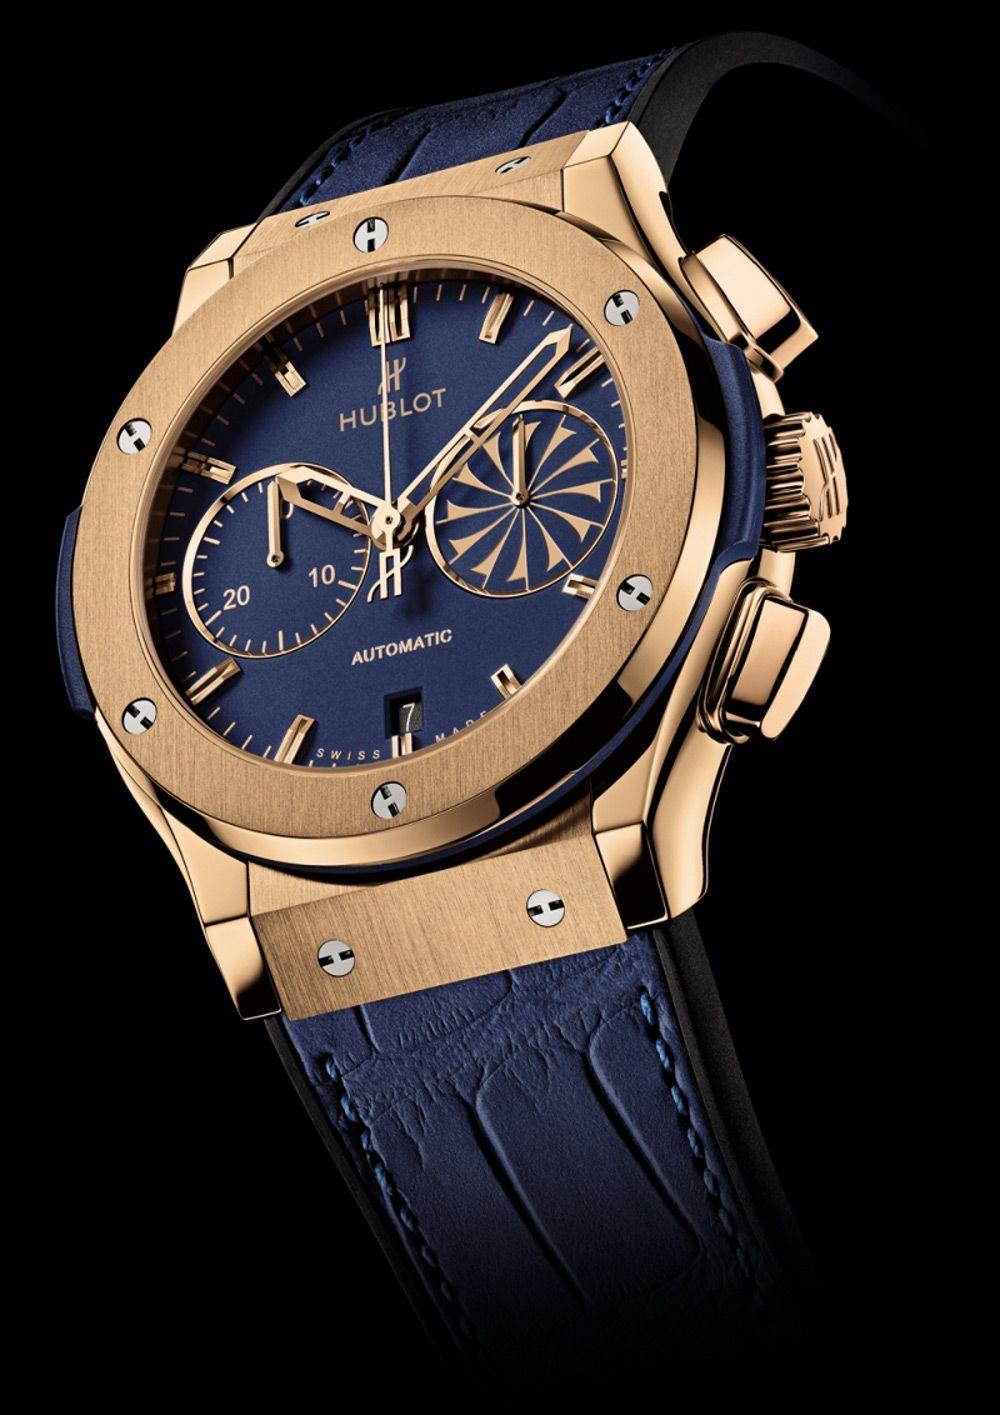 Hublot Mykonos Watch, Two New Limited Editions - eXtravaganzi